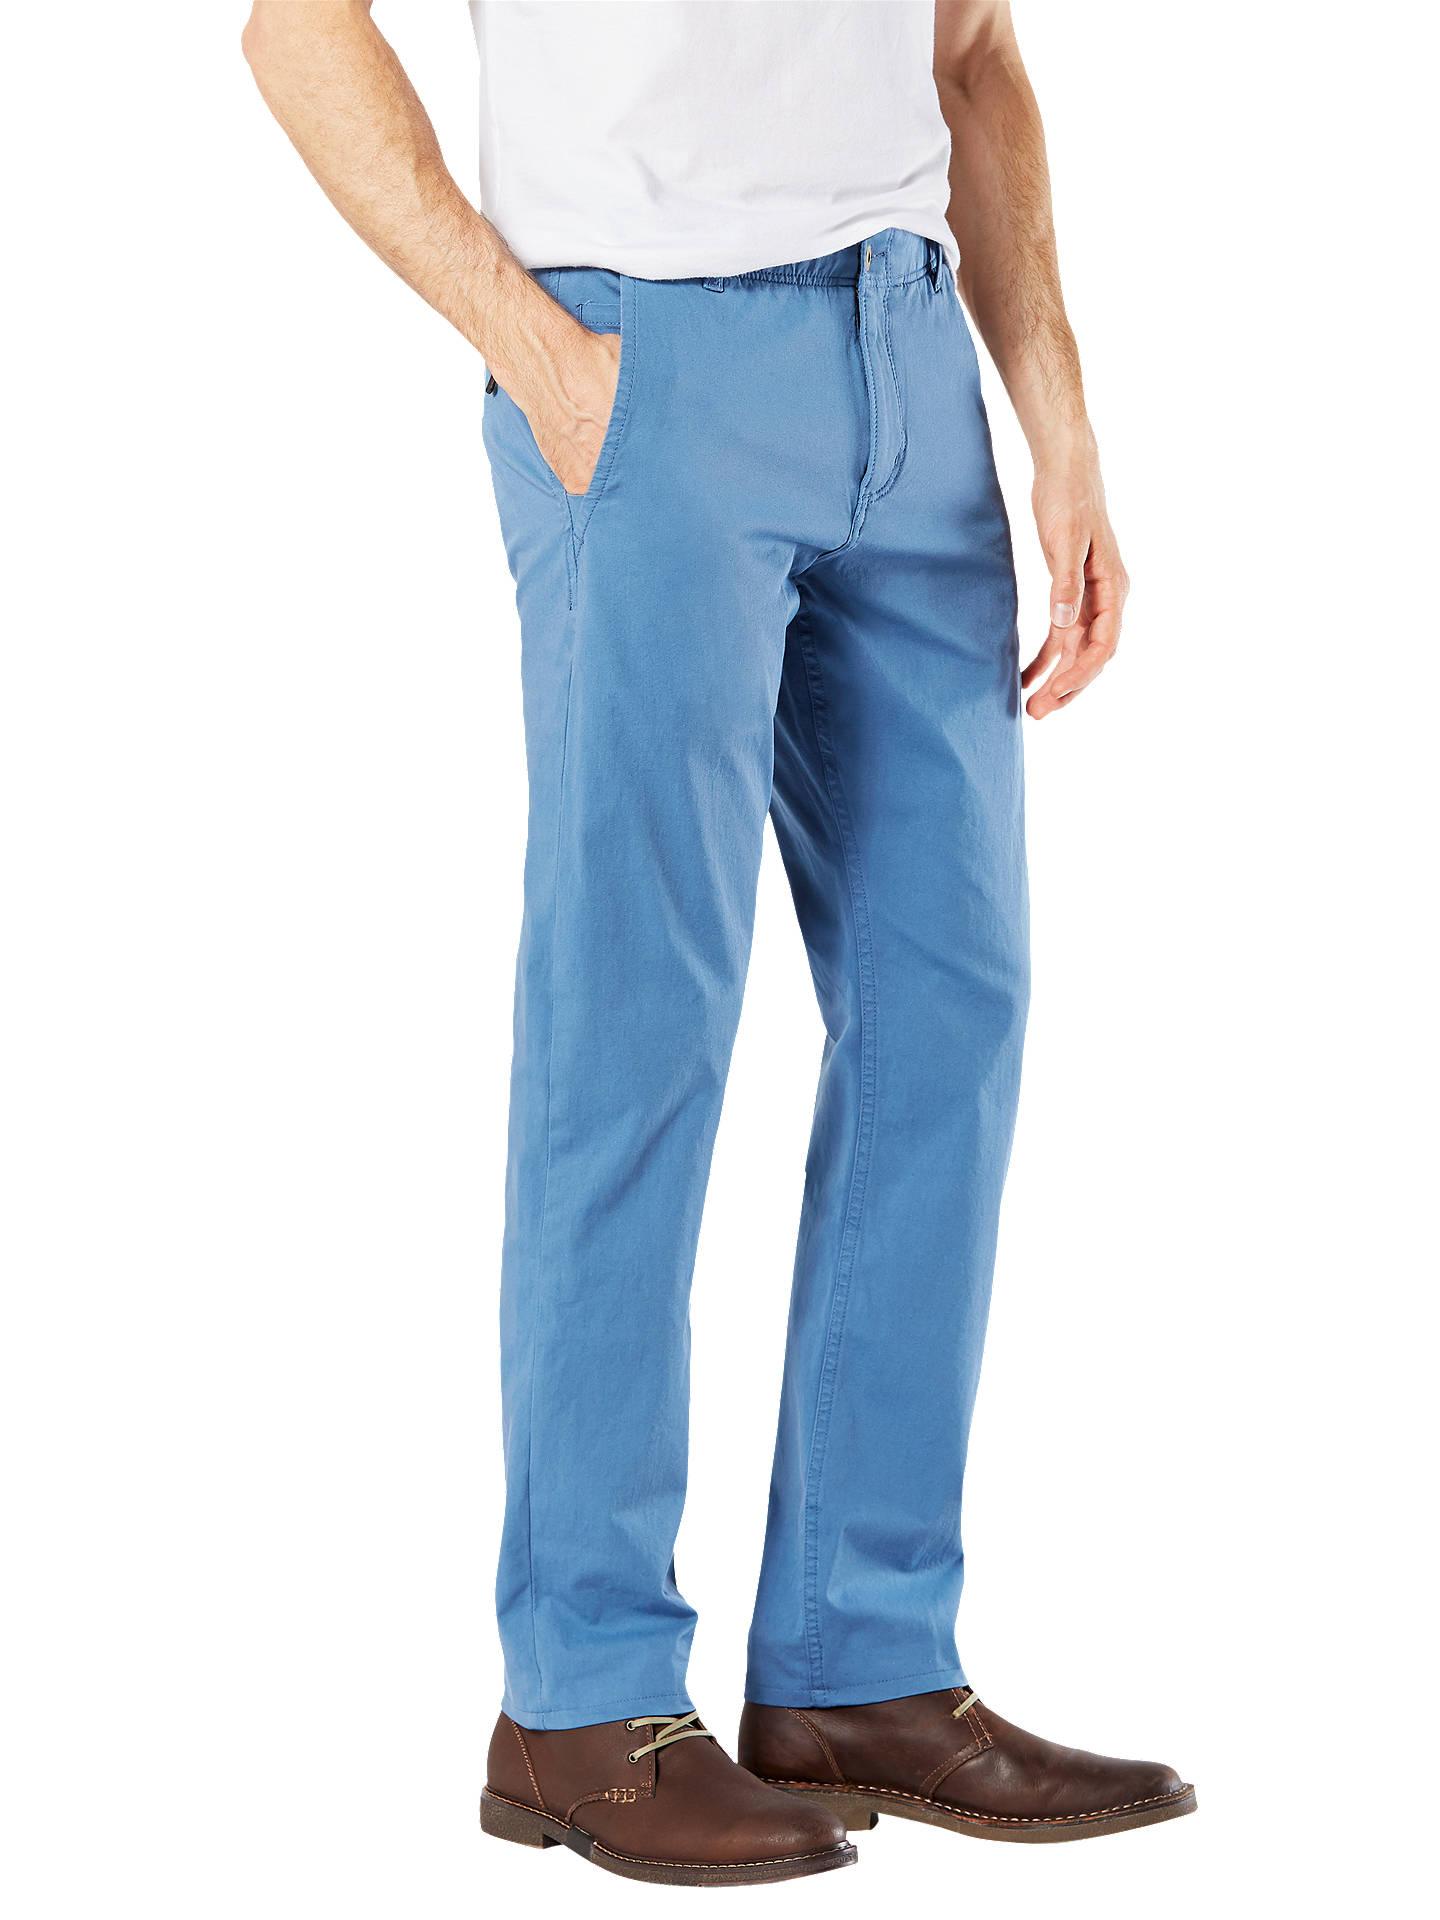 3a93c2a6ef33b8 ... Buy Dockers Alpha Khaki Smart 360 Flex Slim Tapered Trousers, Sunset  Blue, 32S Online